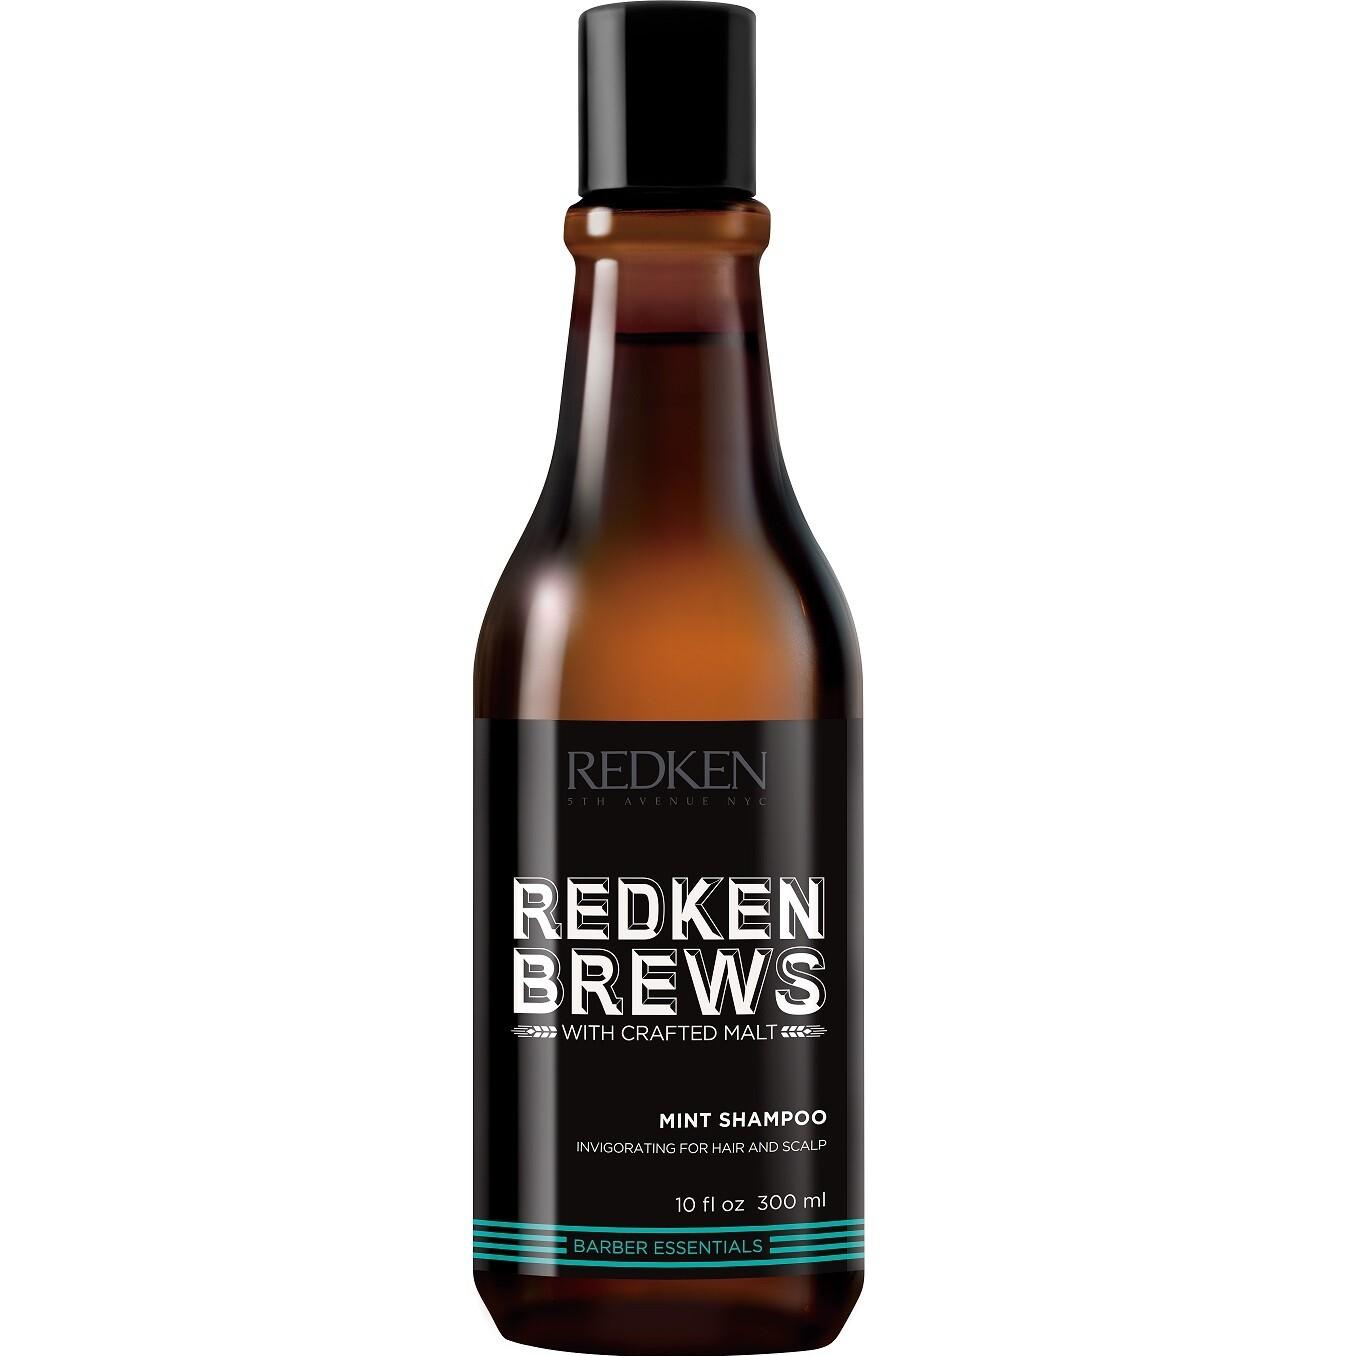 Redken Brews Mint Shampoo - Тонизирующий шампунь 300 мл